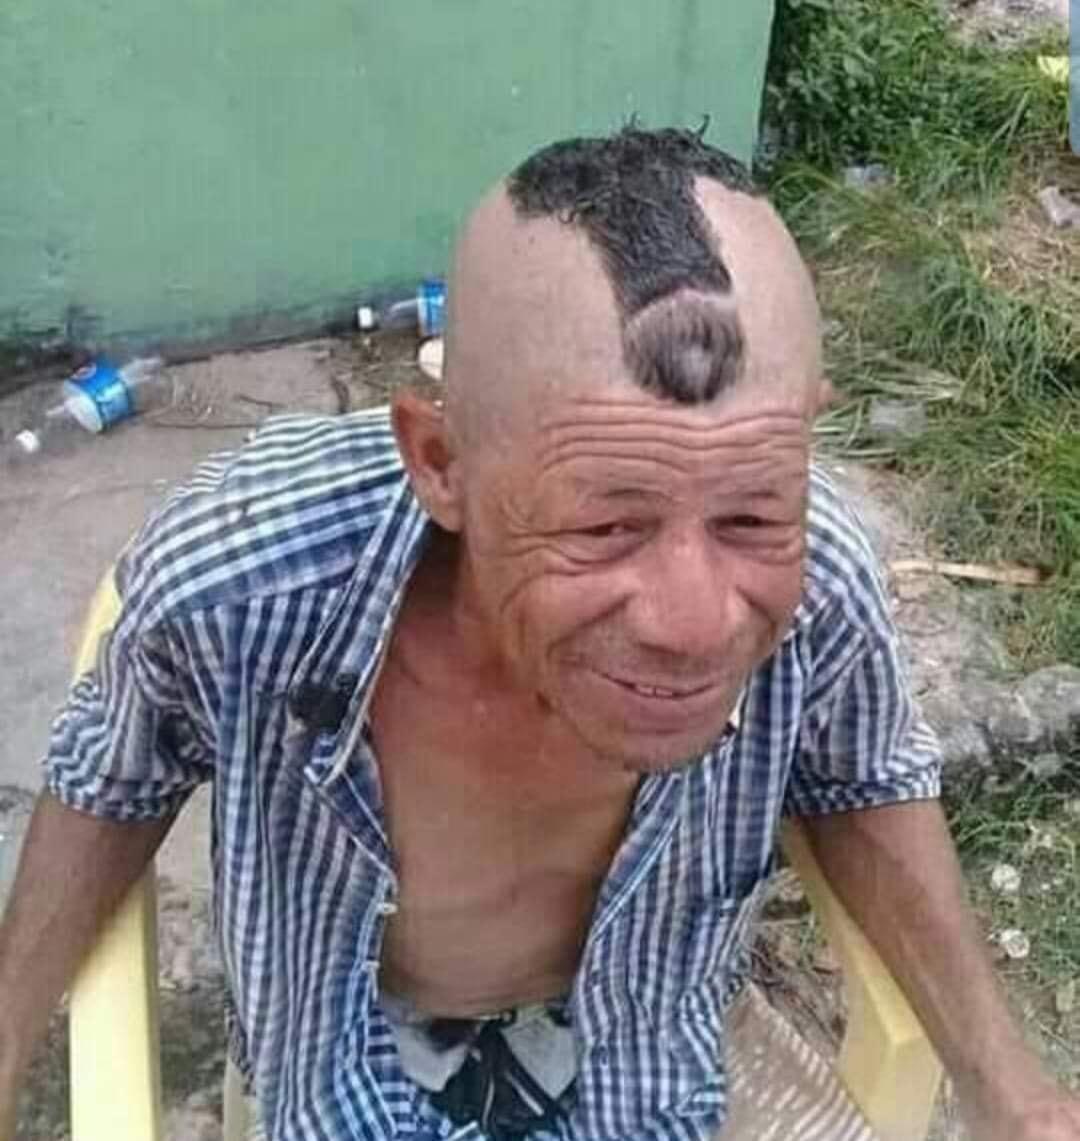 Opiniones sobre el corte de pelo d pelo d mi abuelo? - meme